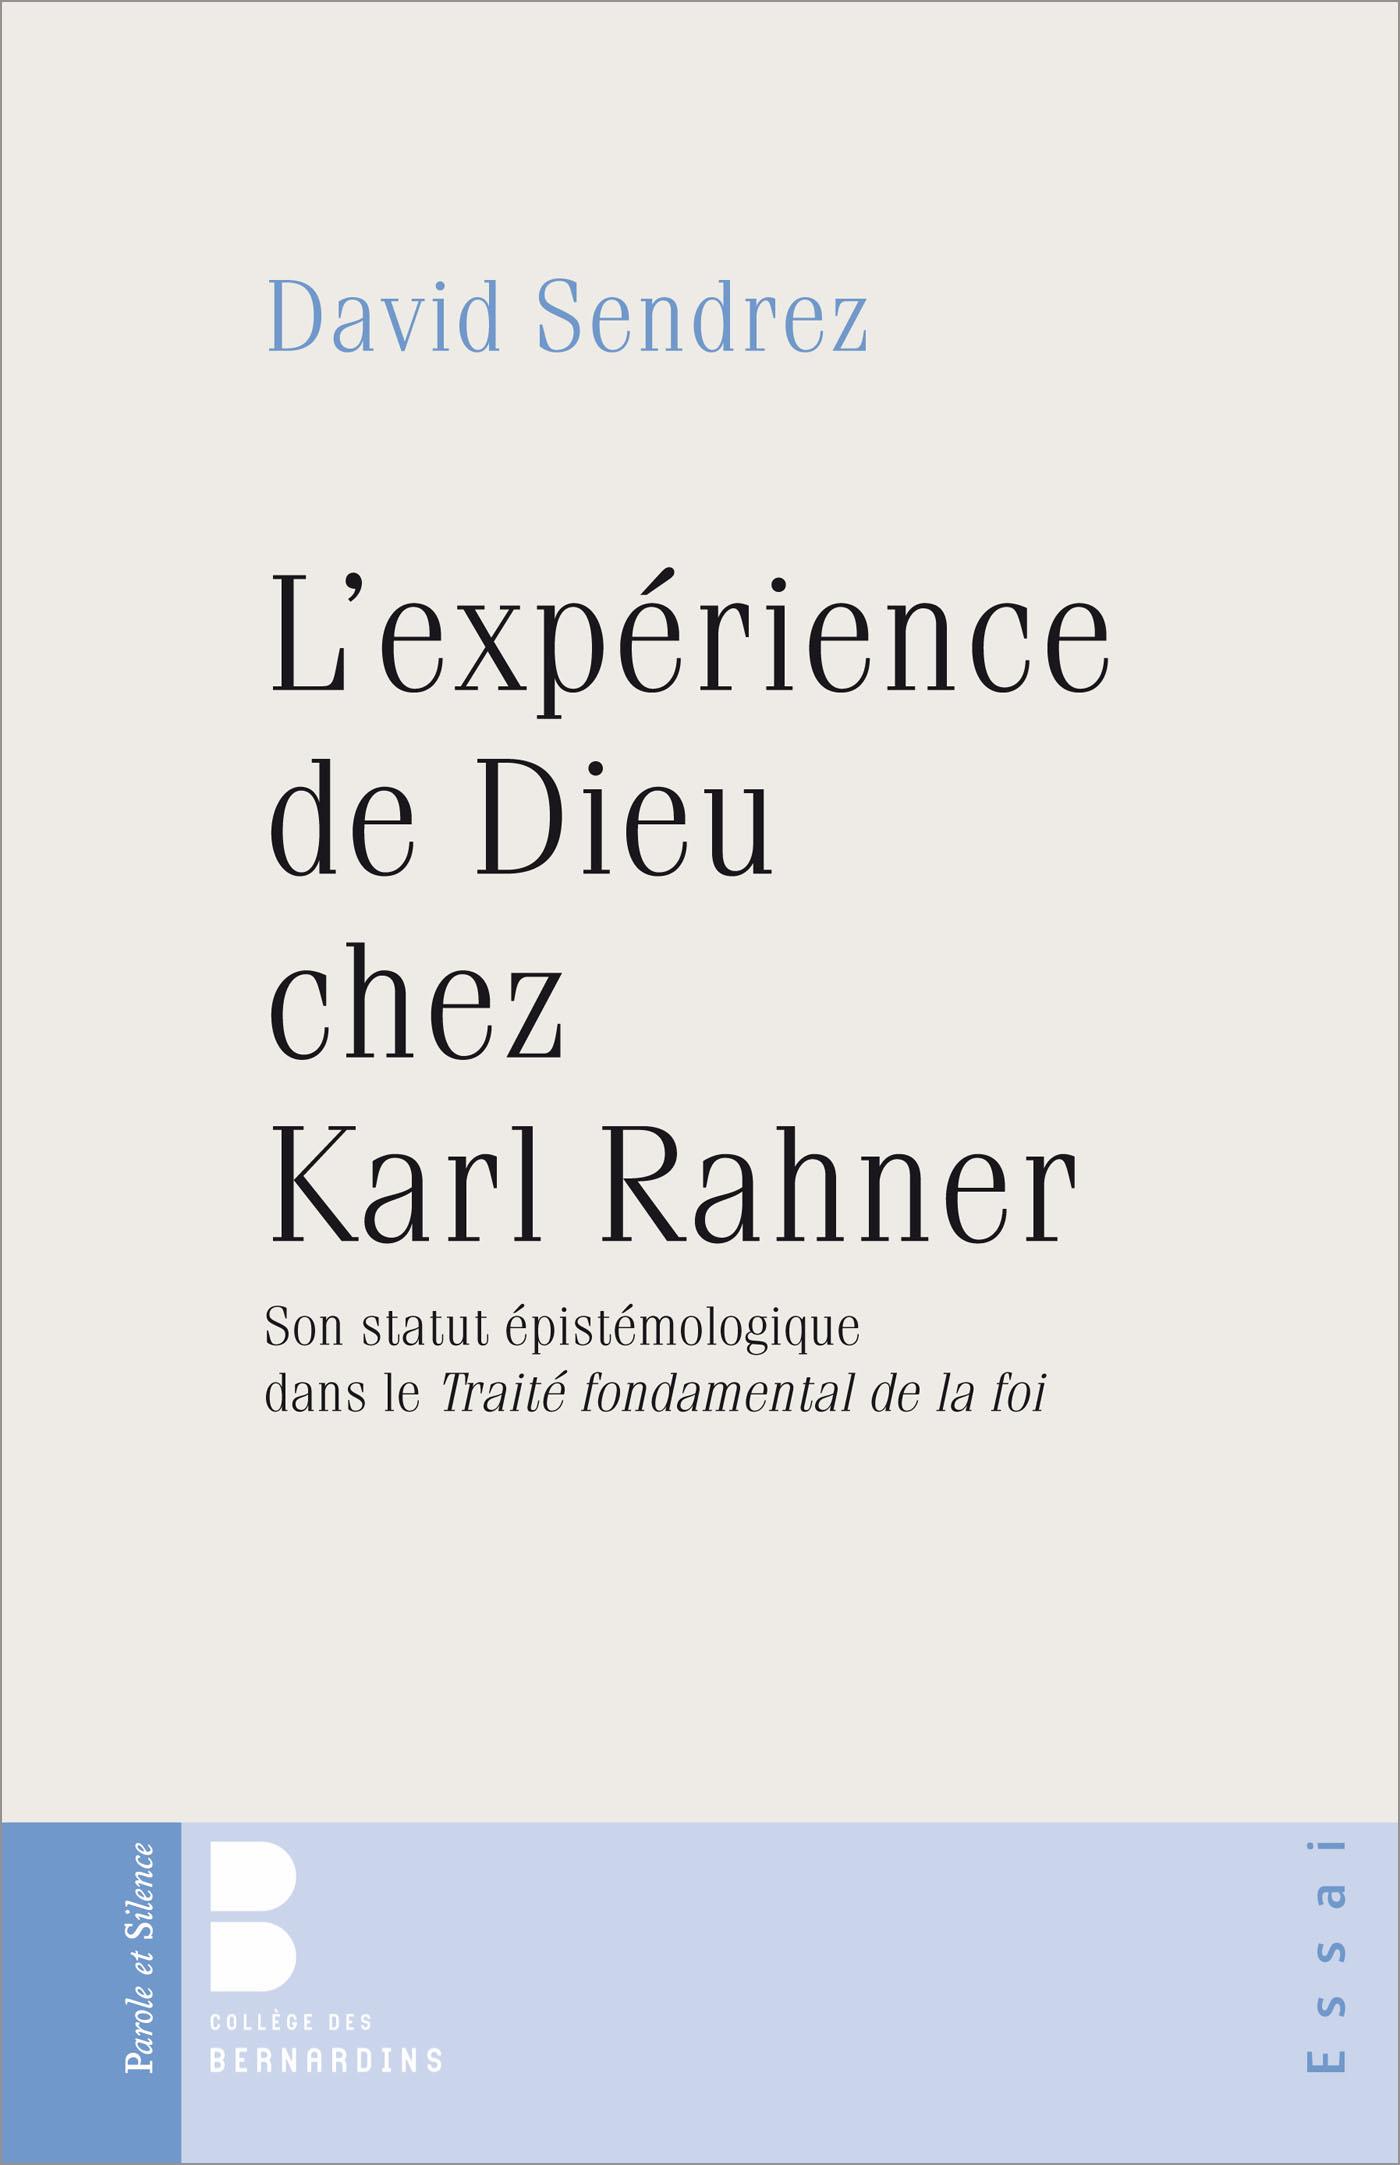 L'expérience de Dieu chez Karl Rahner